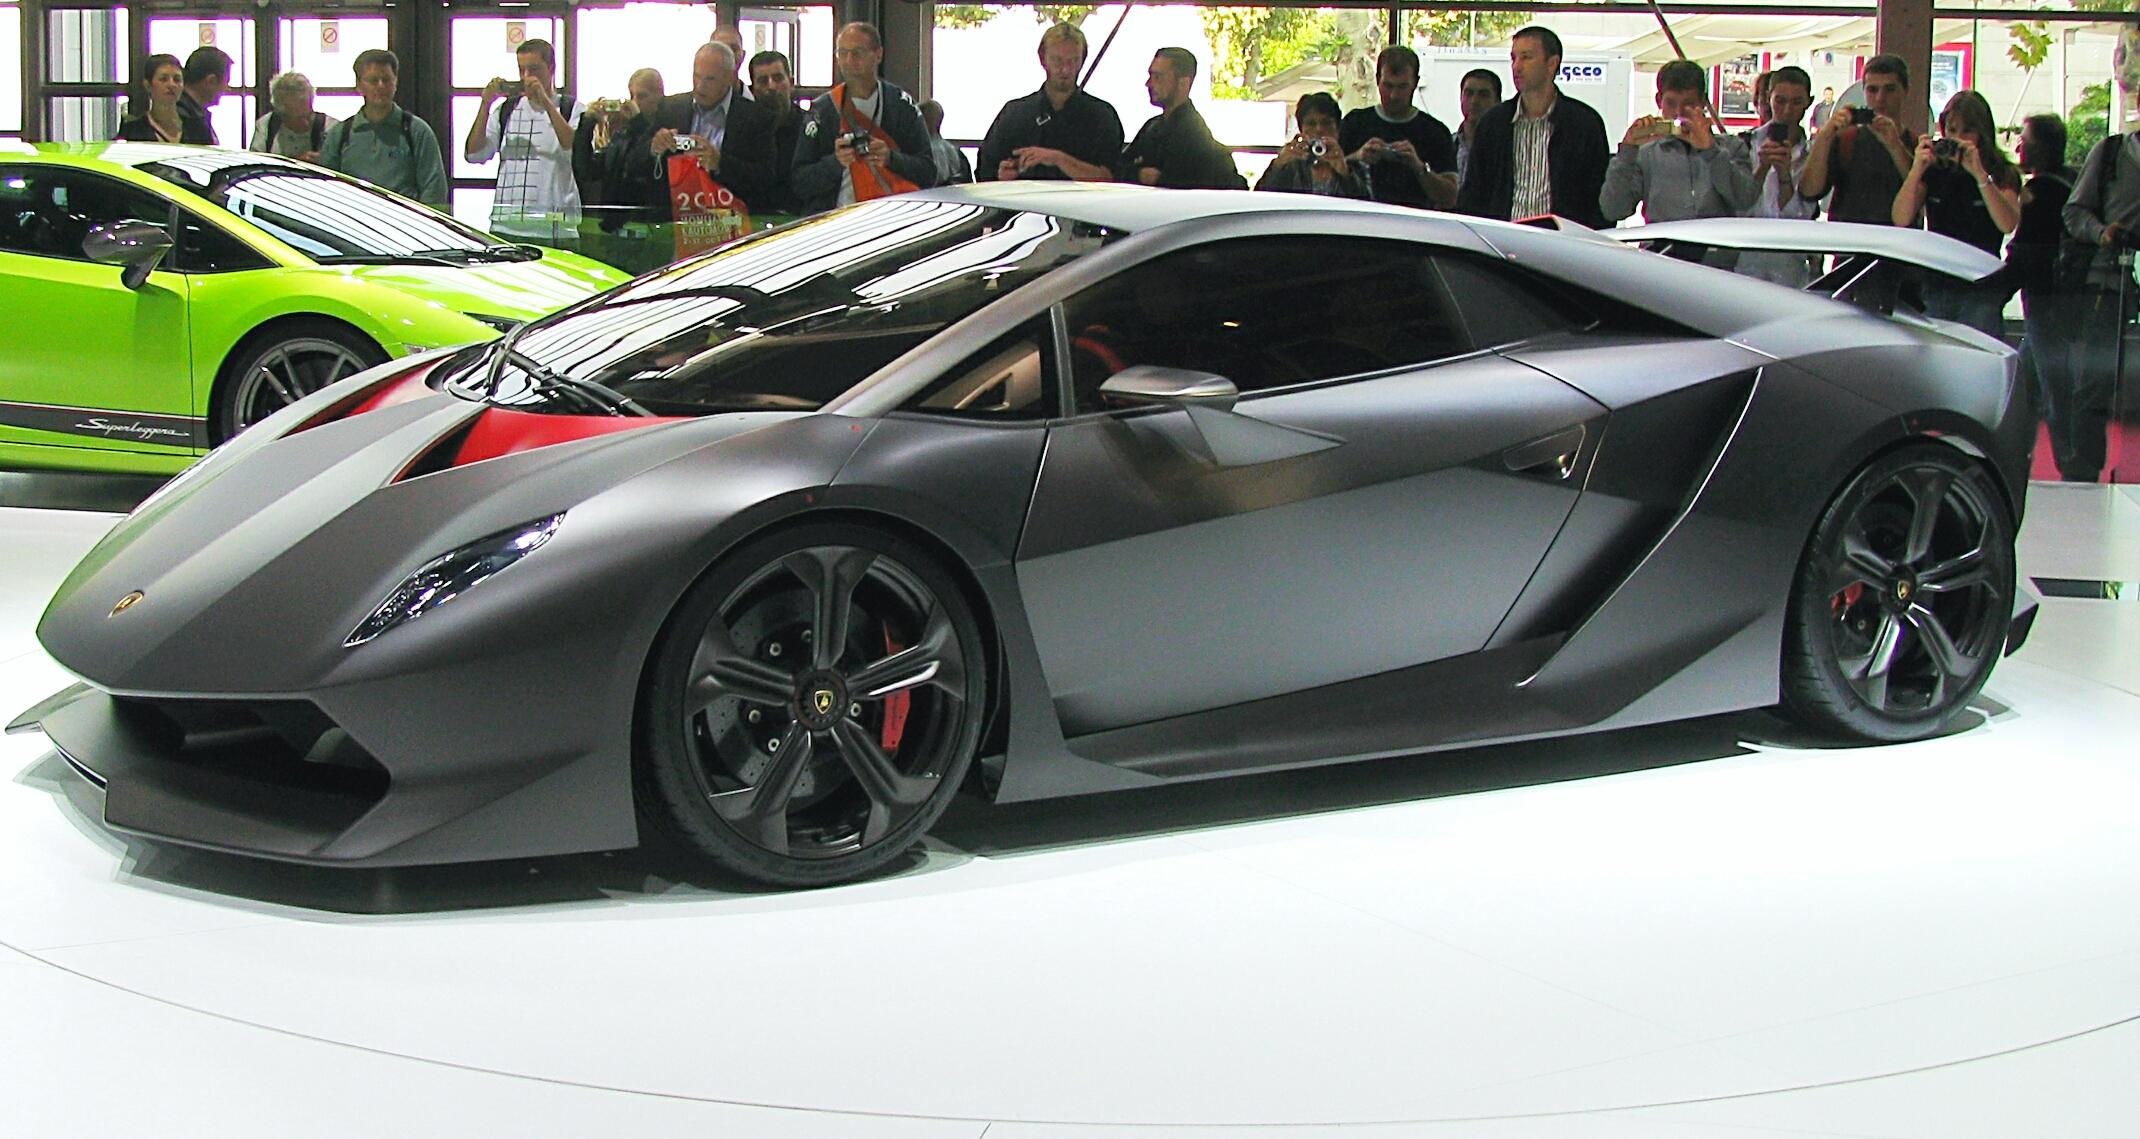 File:Lamborghini Sesto Elemento 4.JPG